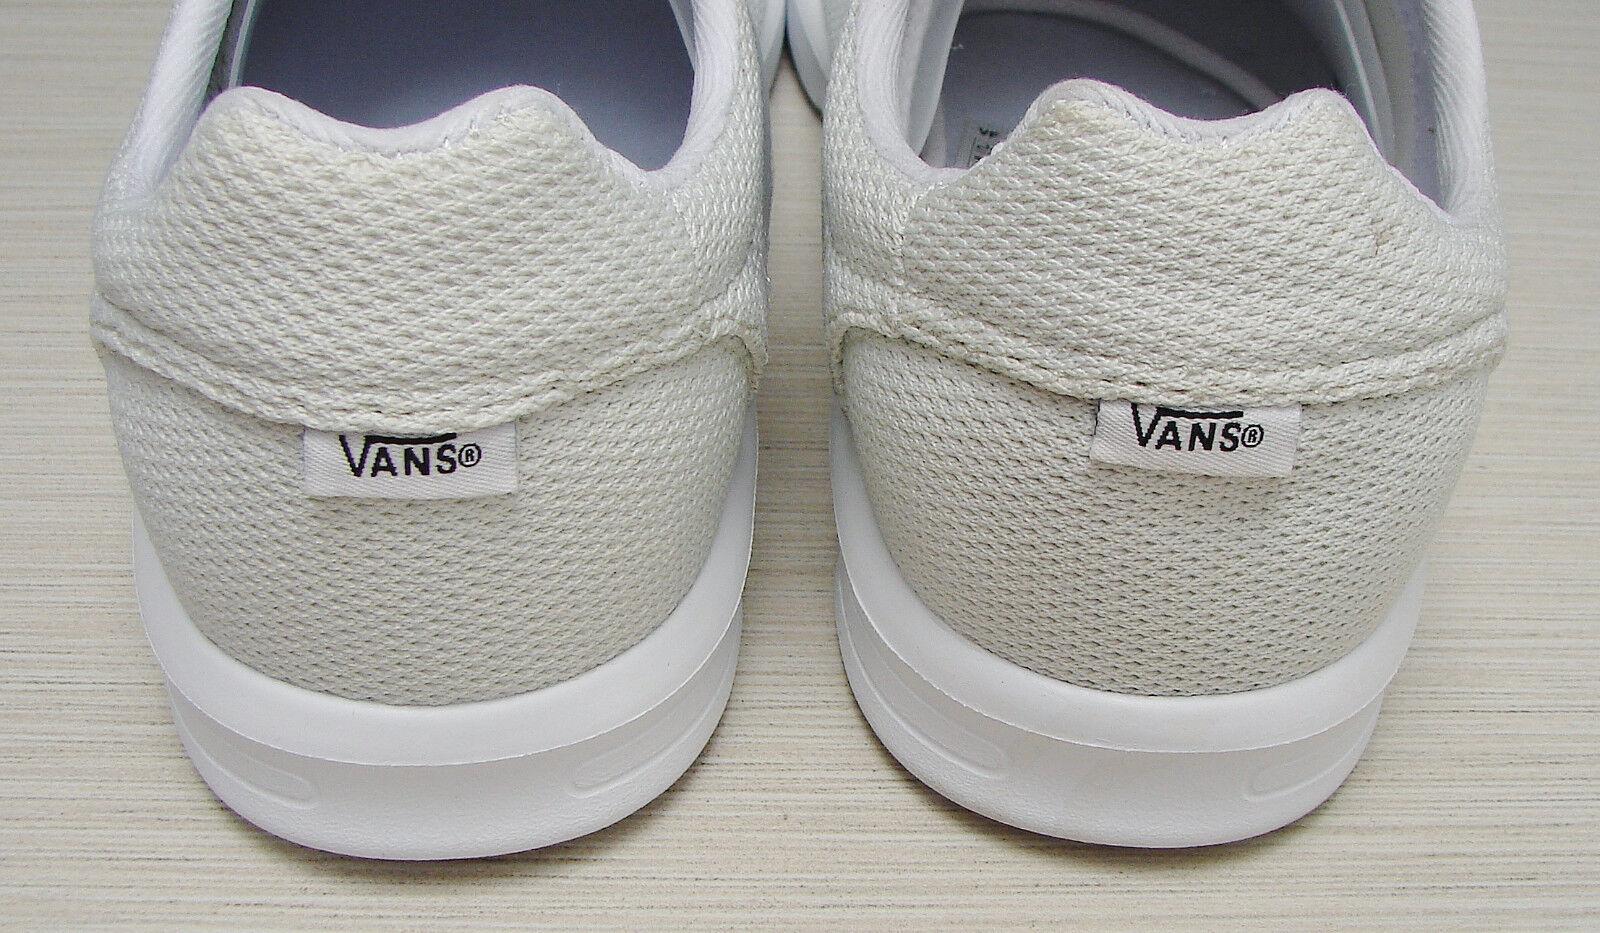 Vans Iso 1.5 Zephir Zephir Zephir bluee True White VN0A2Z5SNS0 Women's Size  8.5 1bdcf3